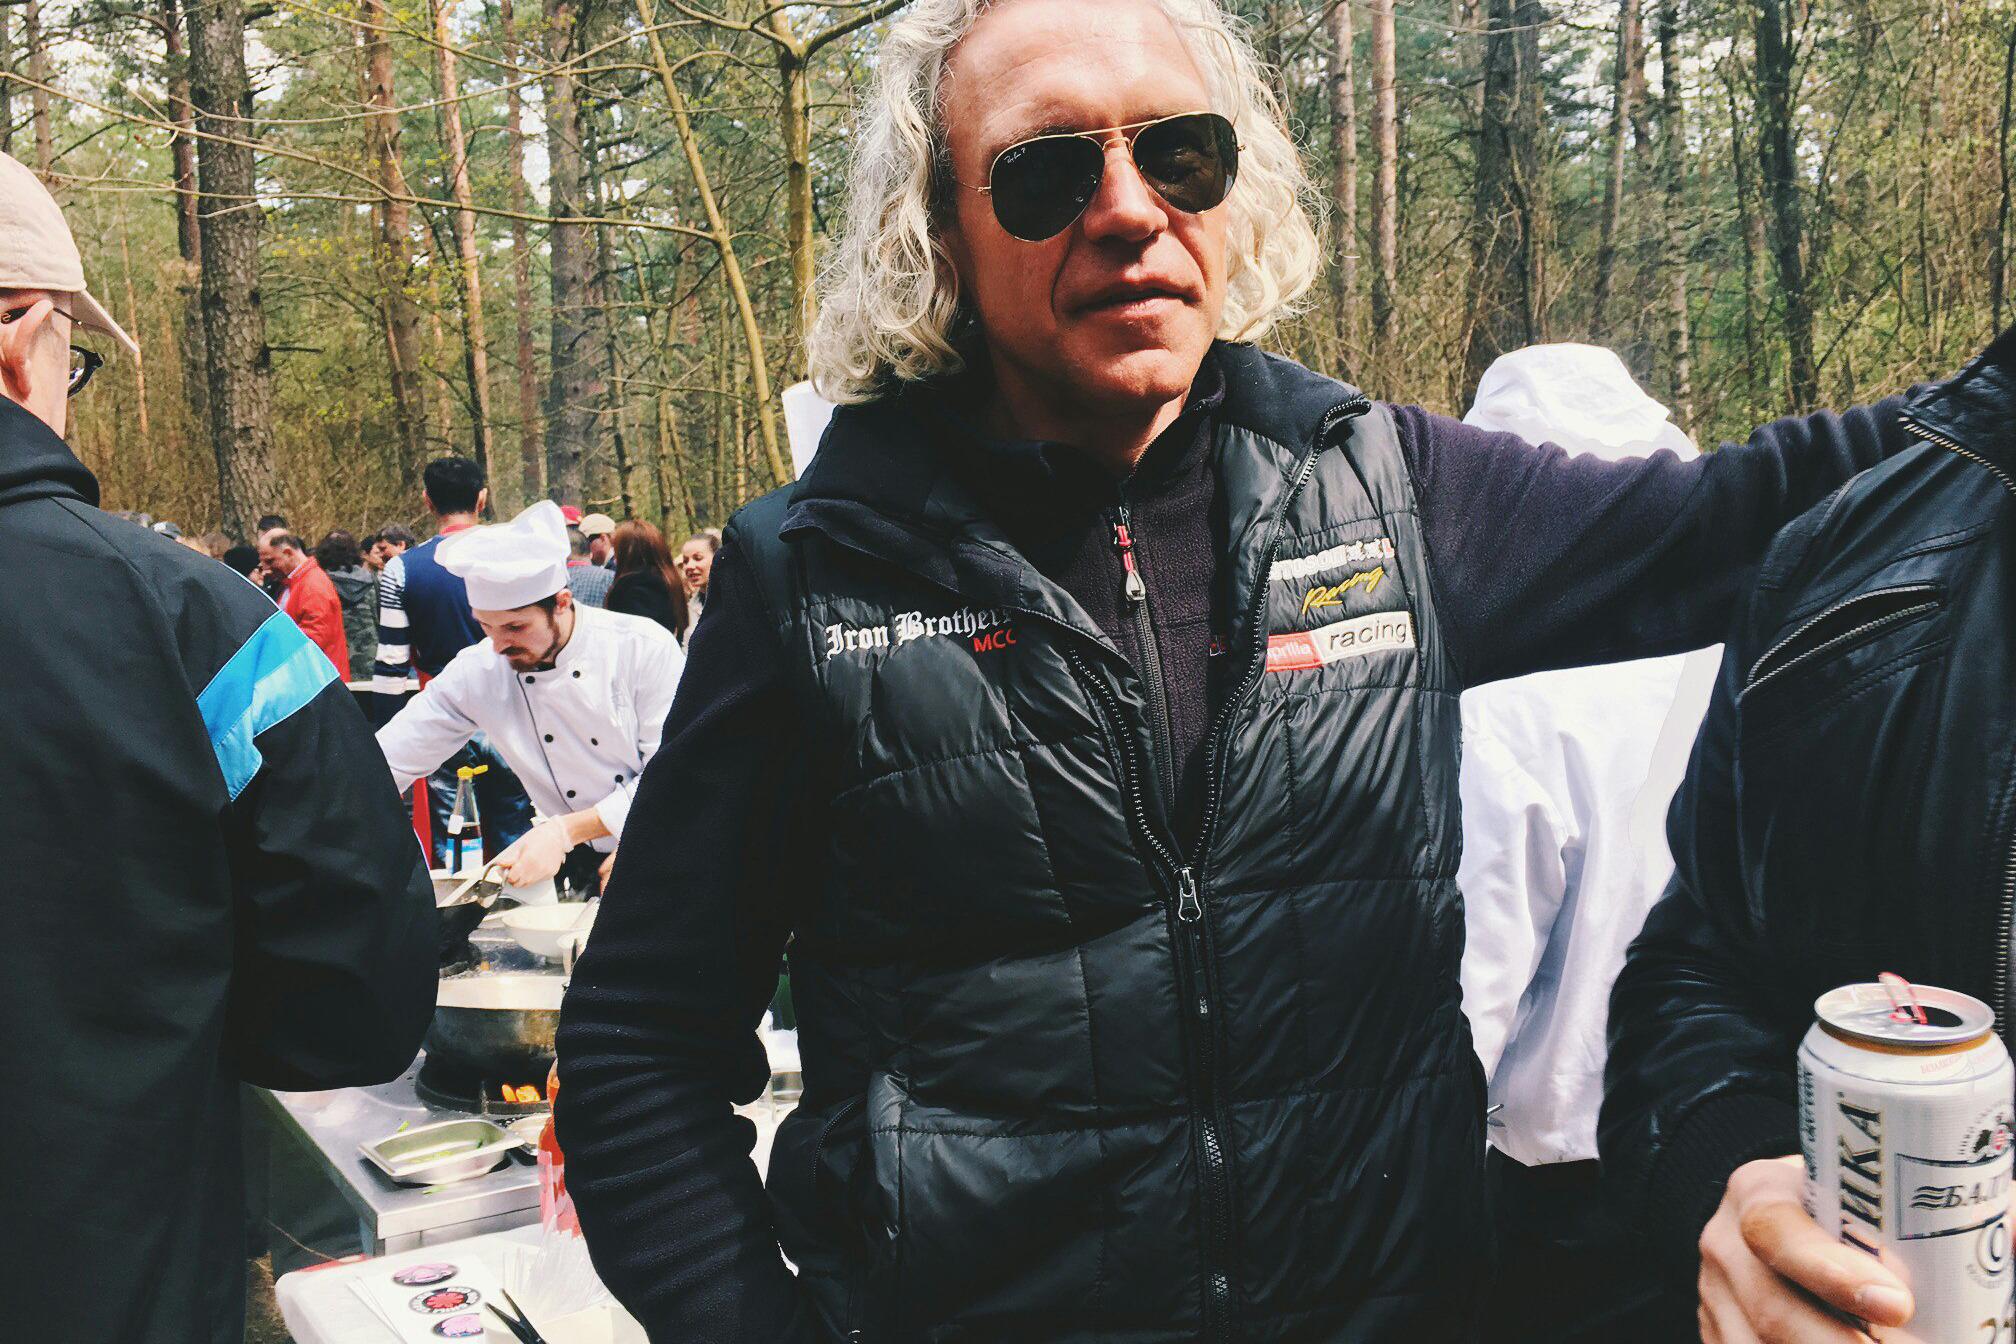 Дмитрий Евхименко, он же Ключ, председатель мотоклуба Iron Brothers